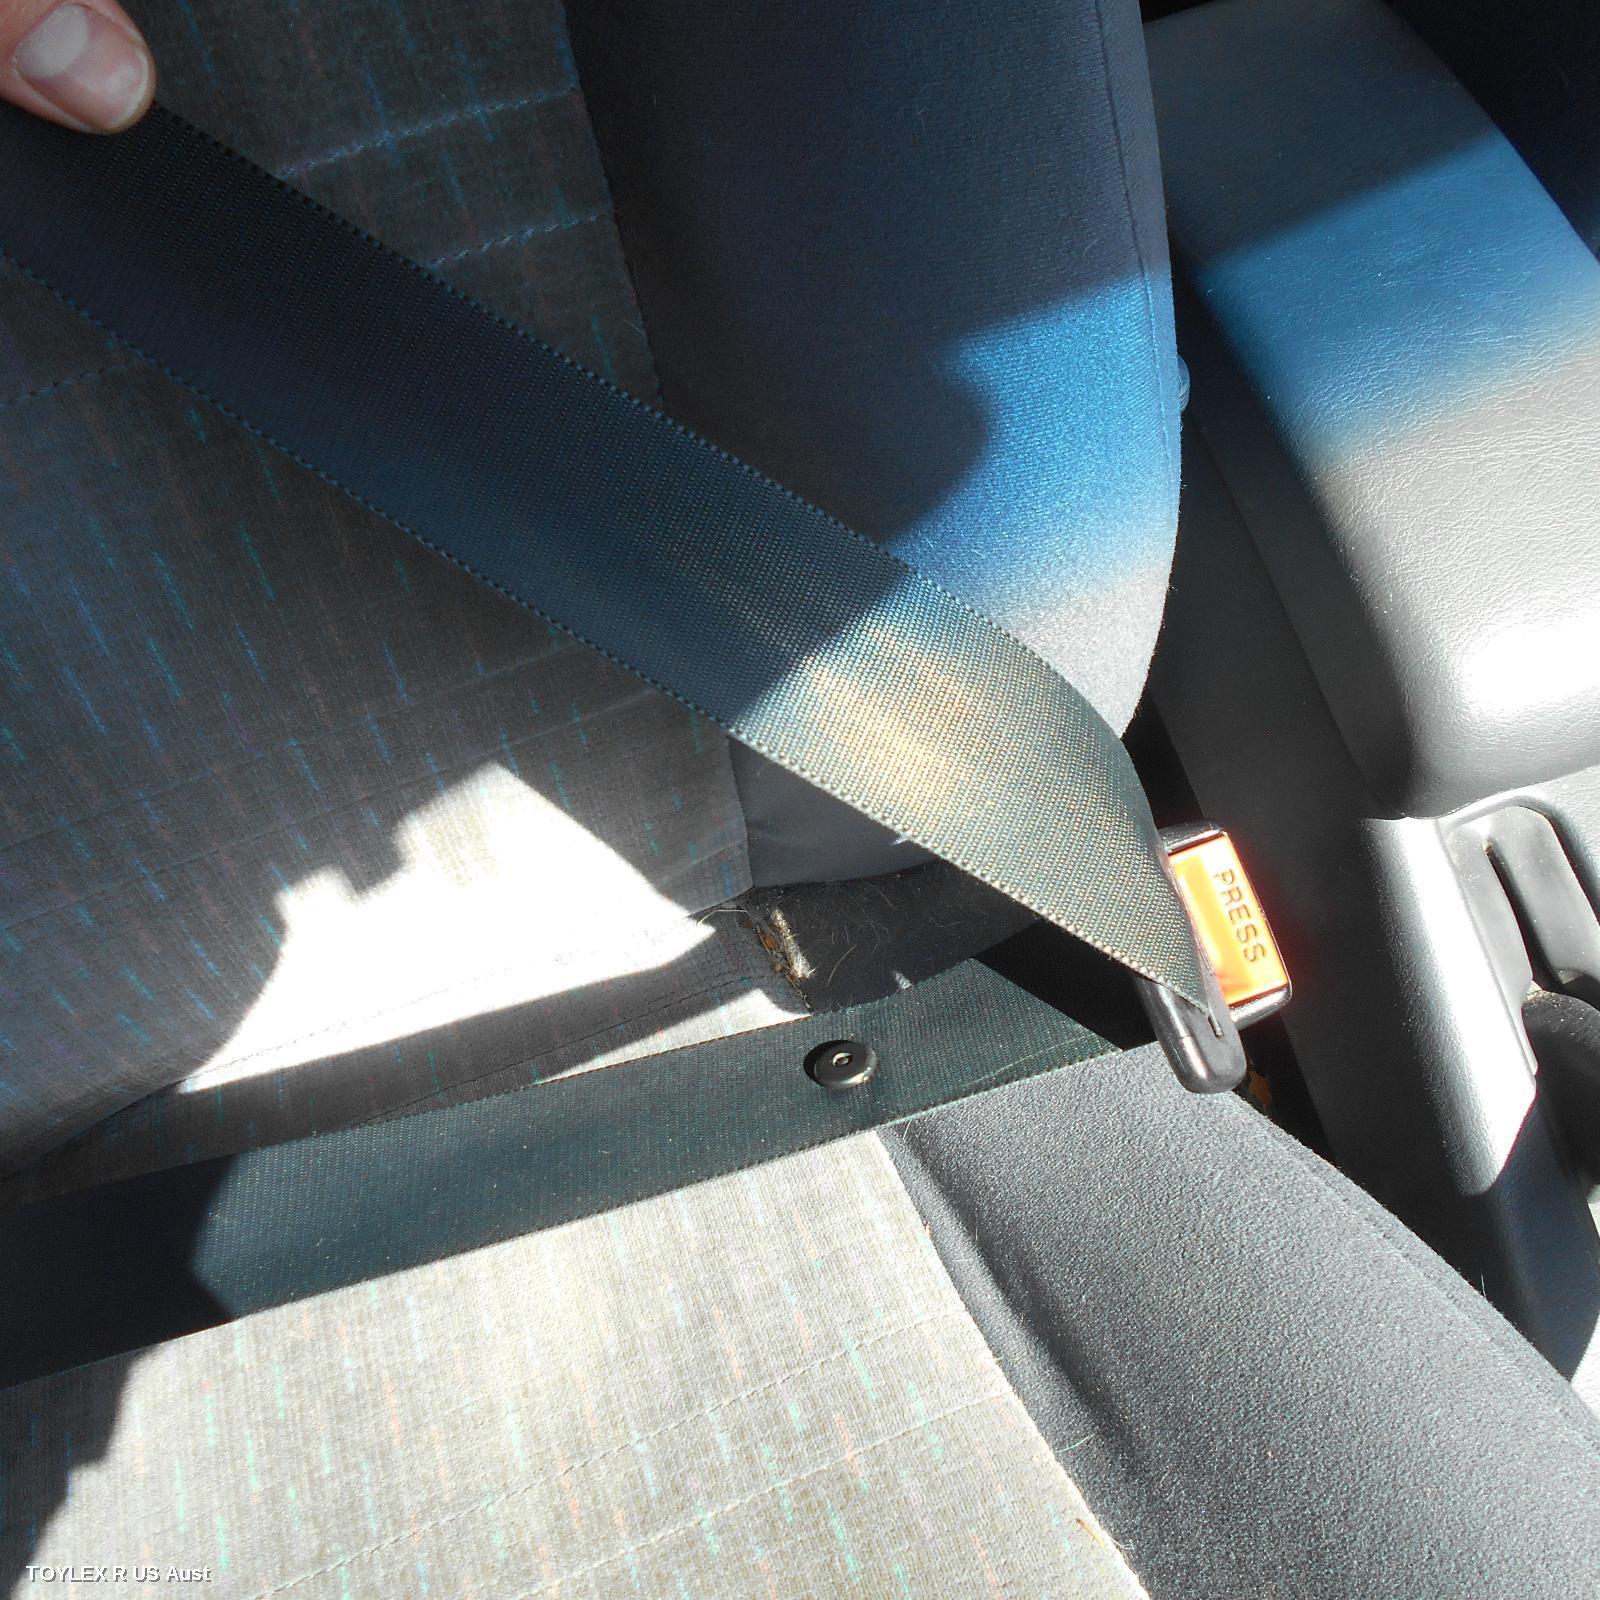 TOYOTA COROLLA, Seatbelt/Stalk, RH FRONT, SEAT BELT ONLY, HATCH, AE101, 05/92-10/99